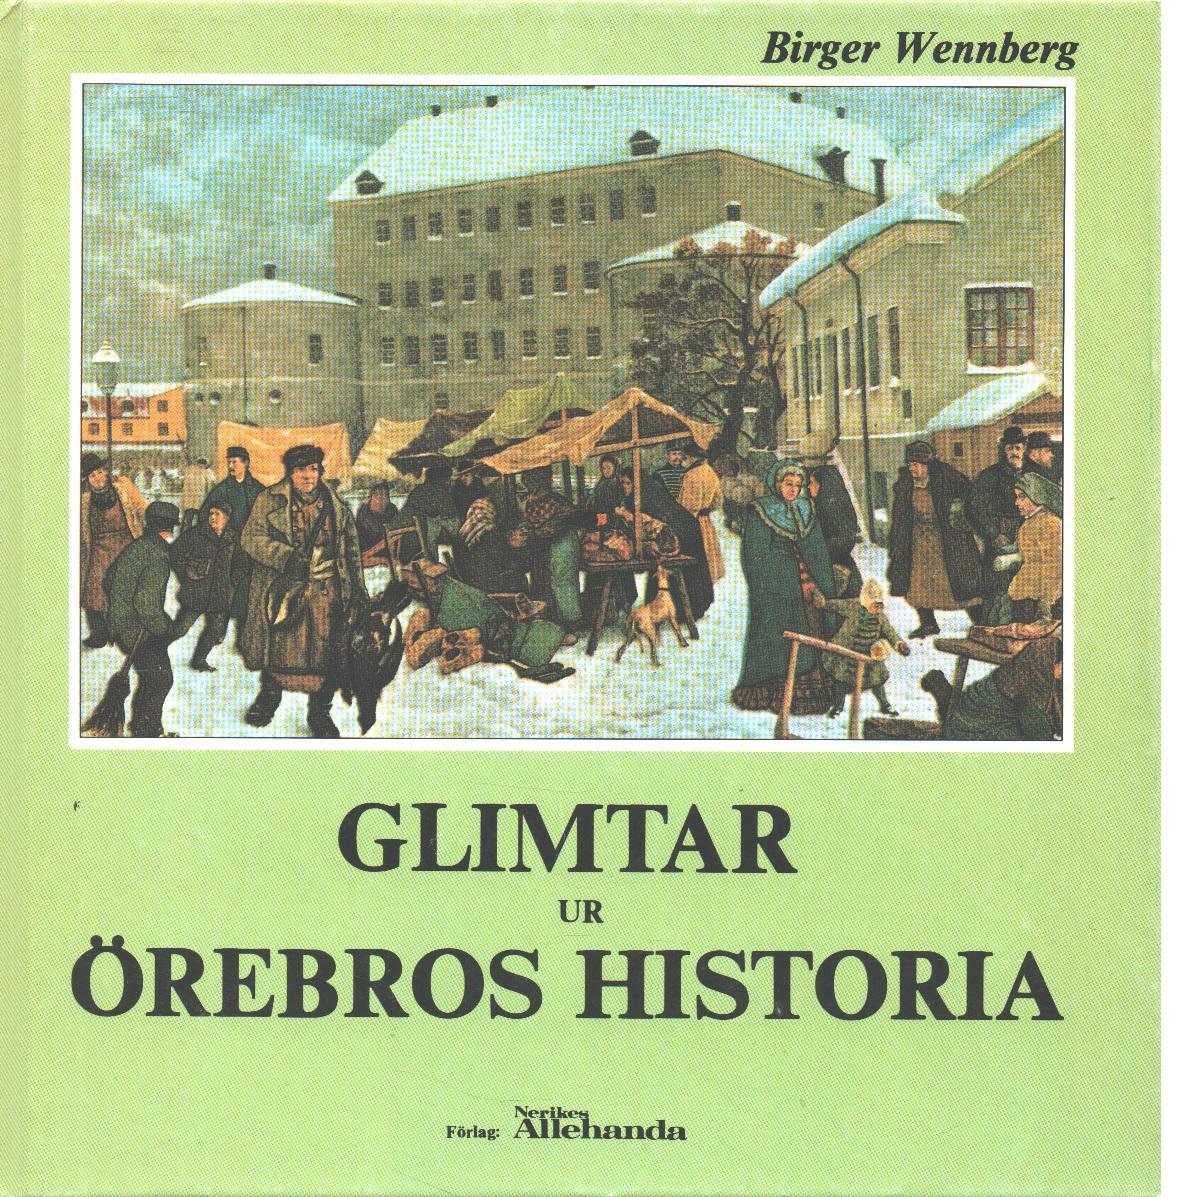 Glimtar ur Örebros historia - Wennberg, Birger